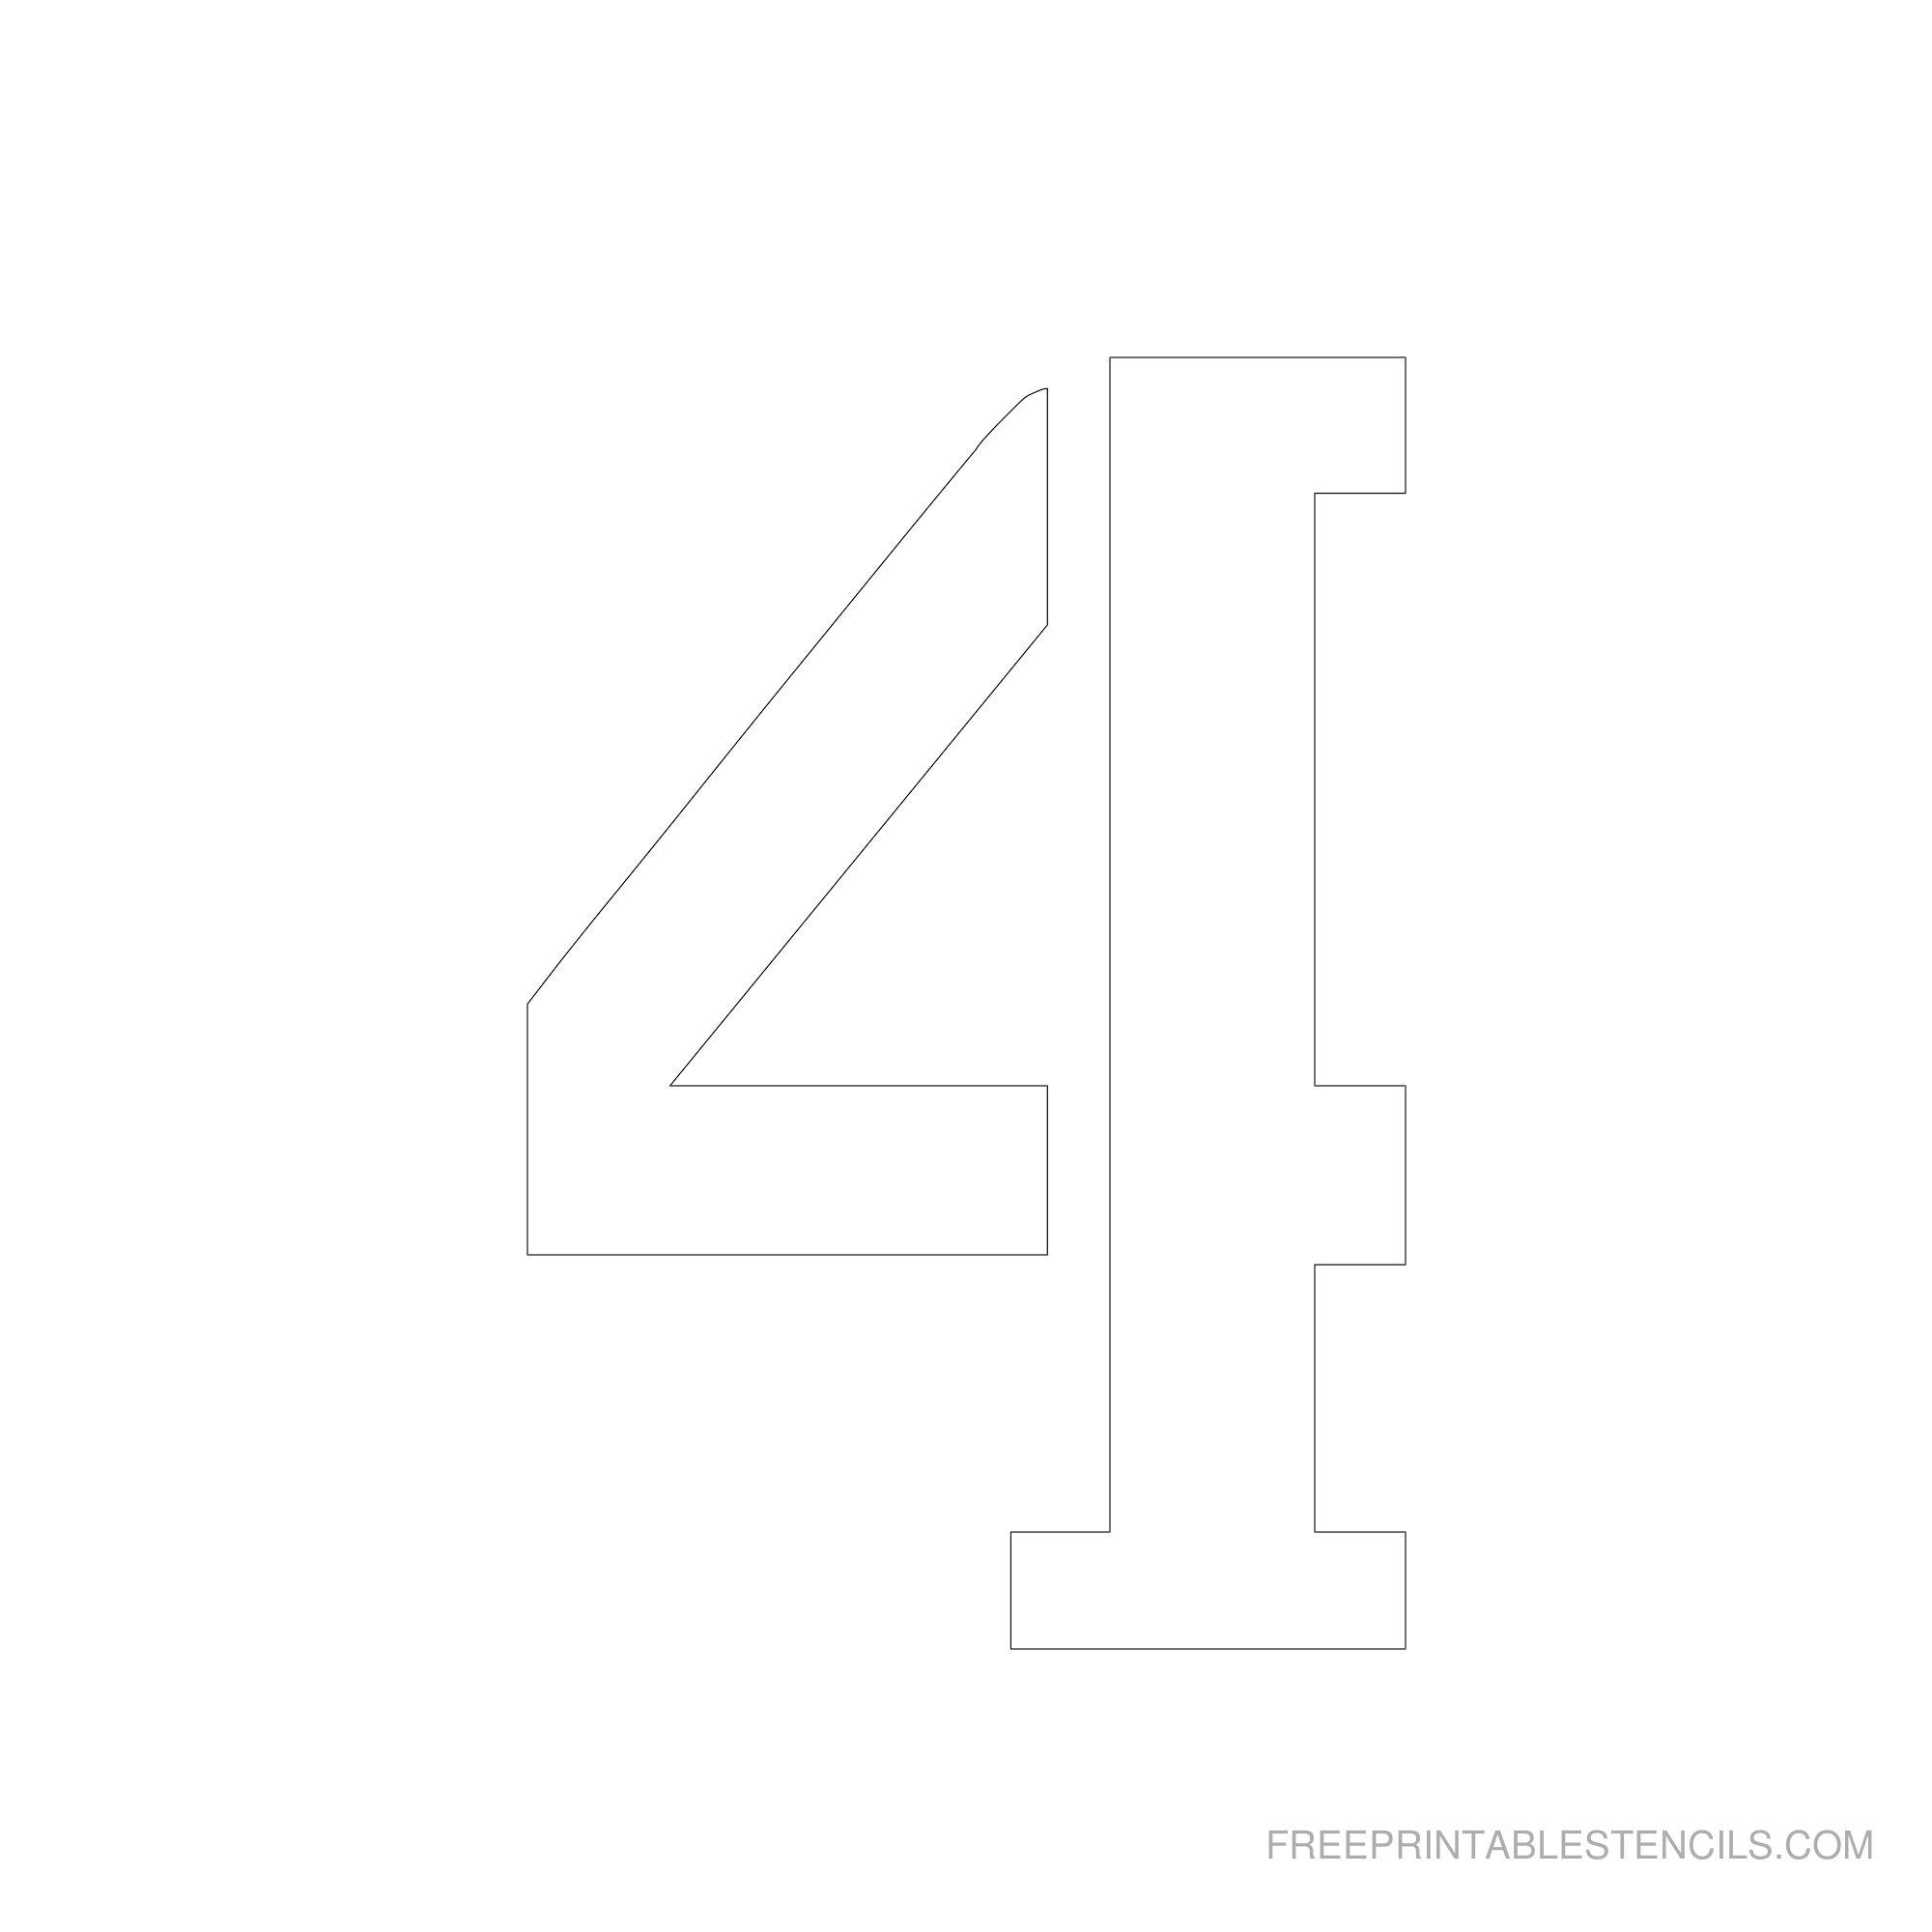 Printable 6 Inch Number Stencils 1-10   Free Printable Stencils - Free Printable Number Stencils